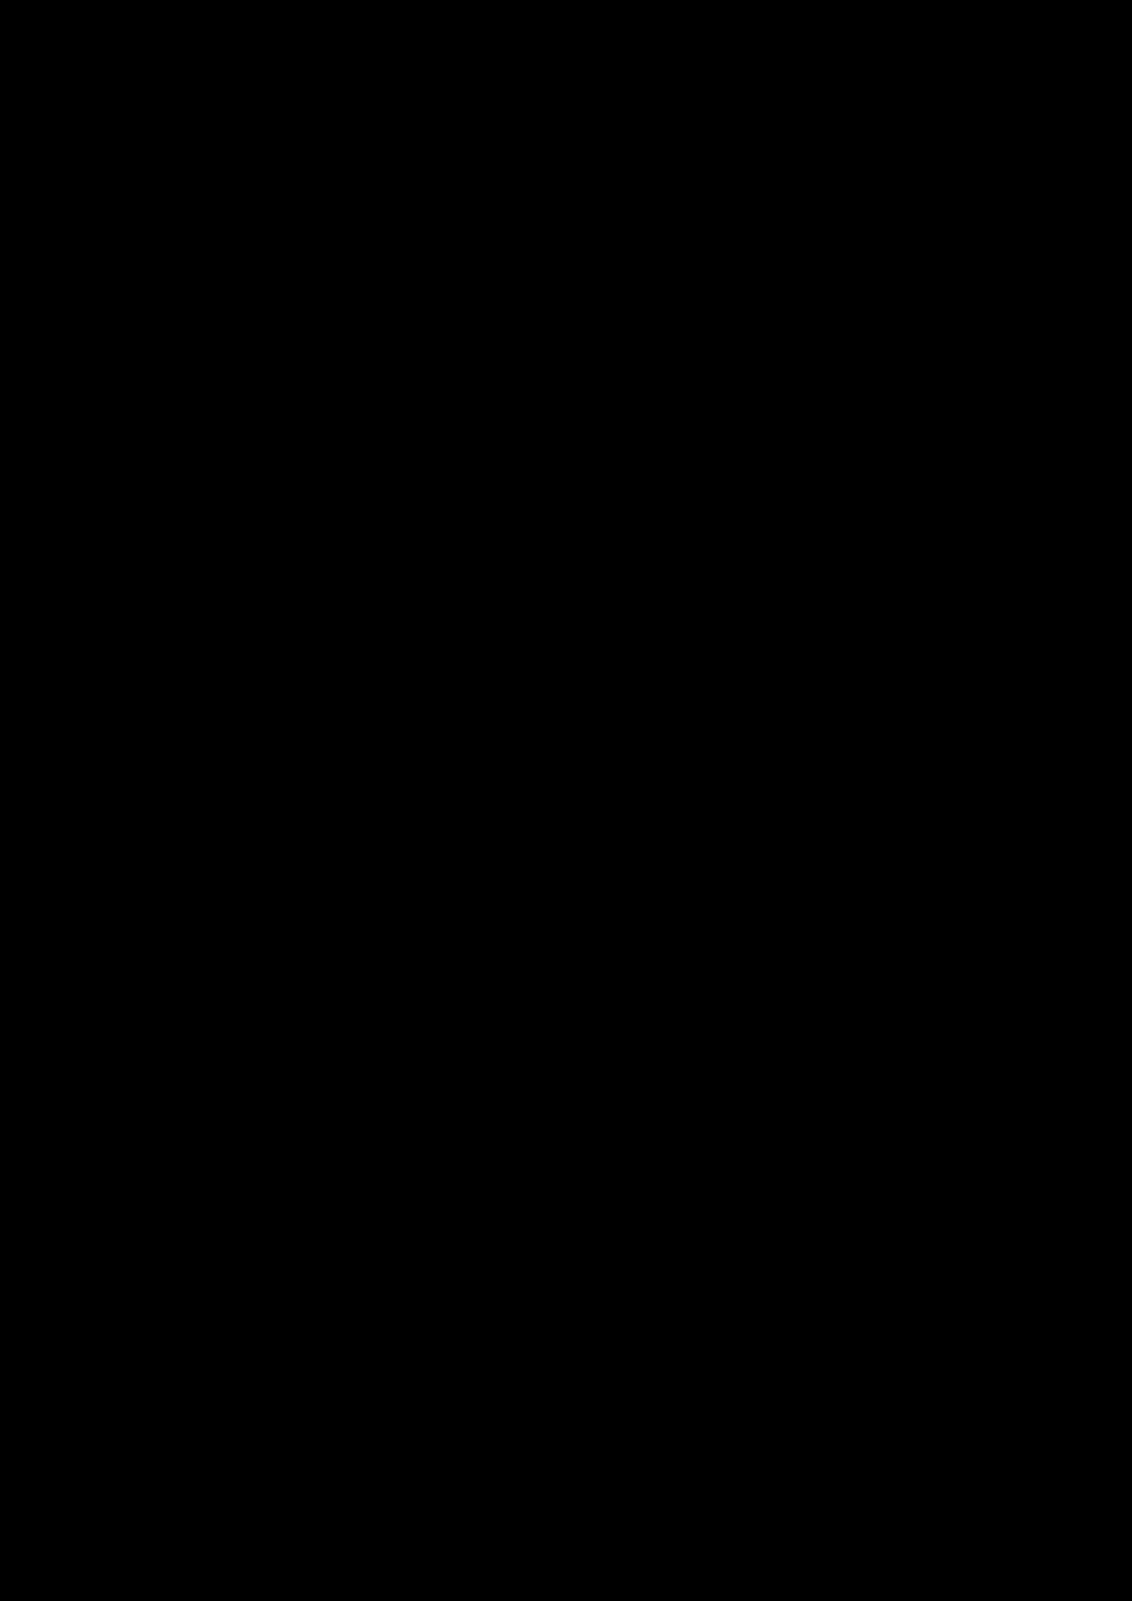 Korolevstvo slez slide, Image 51